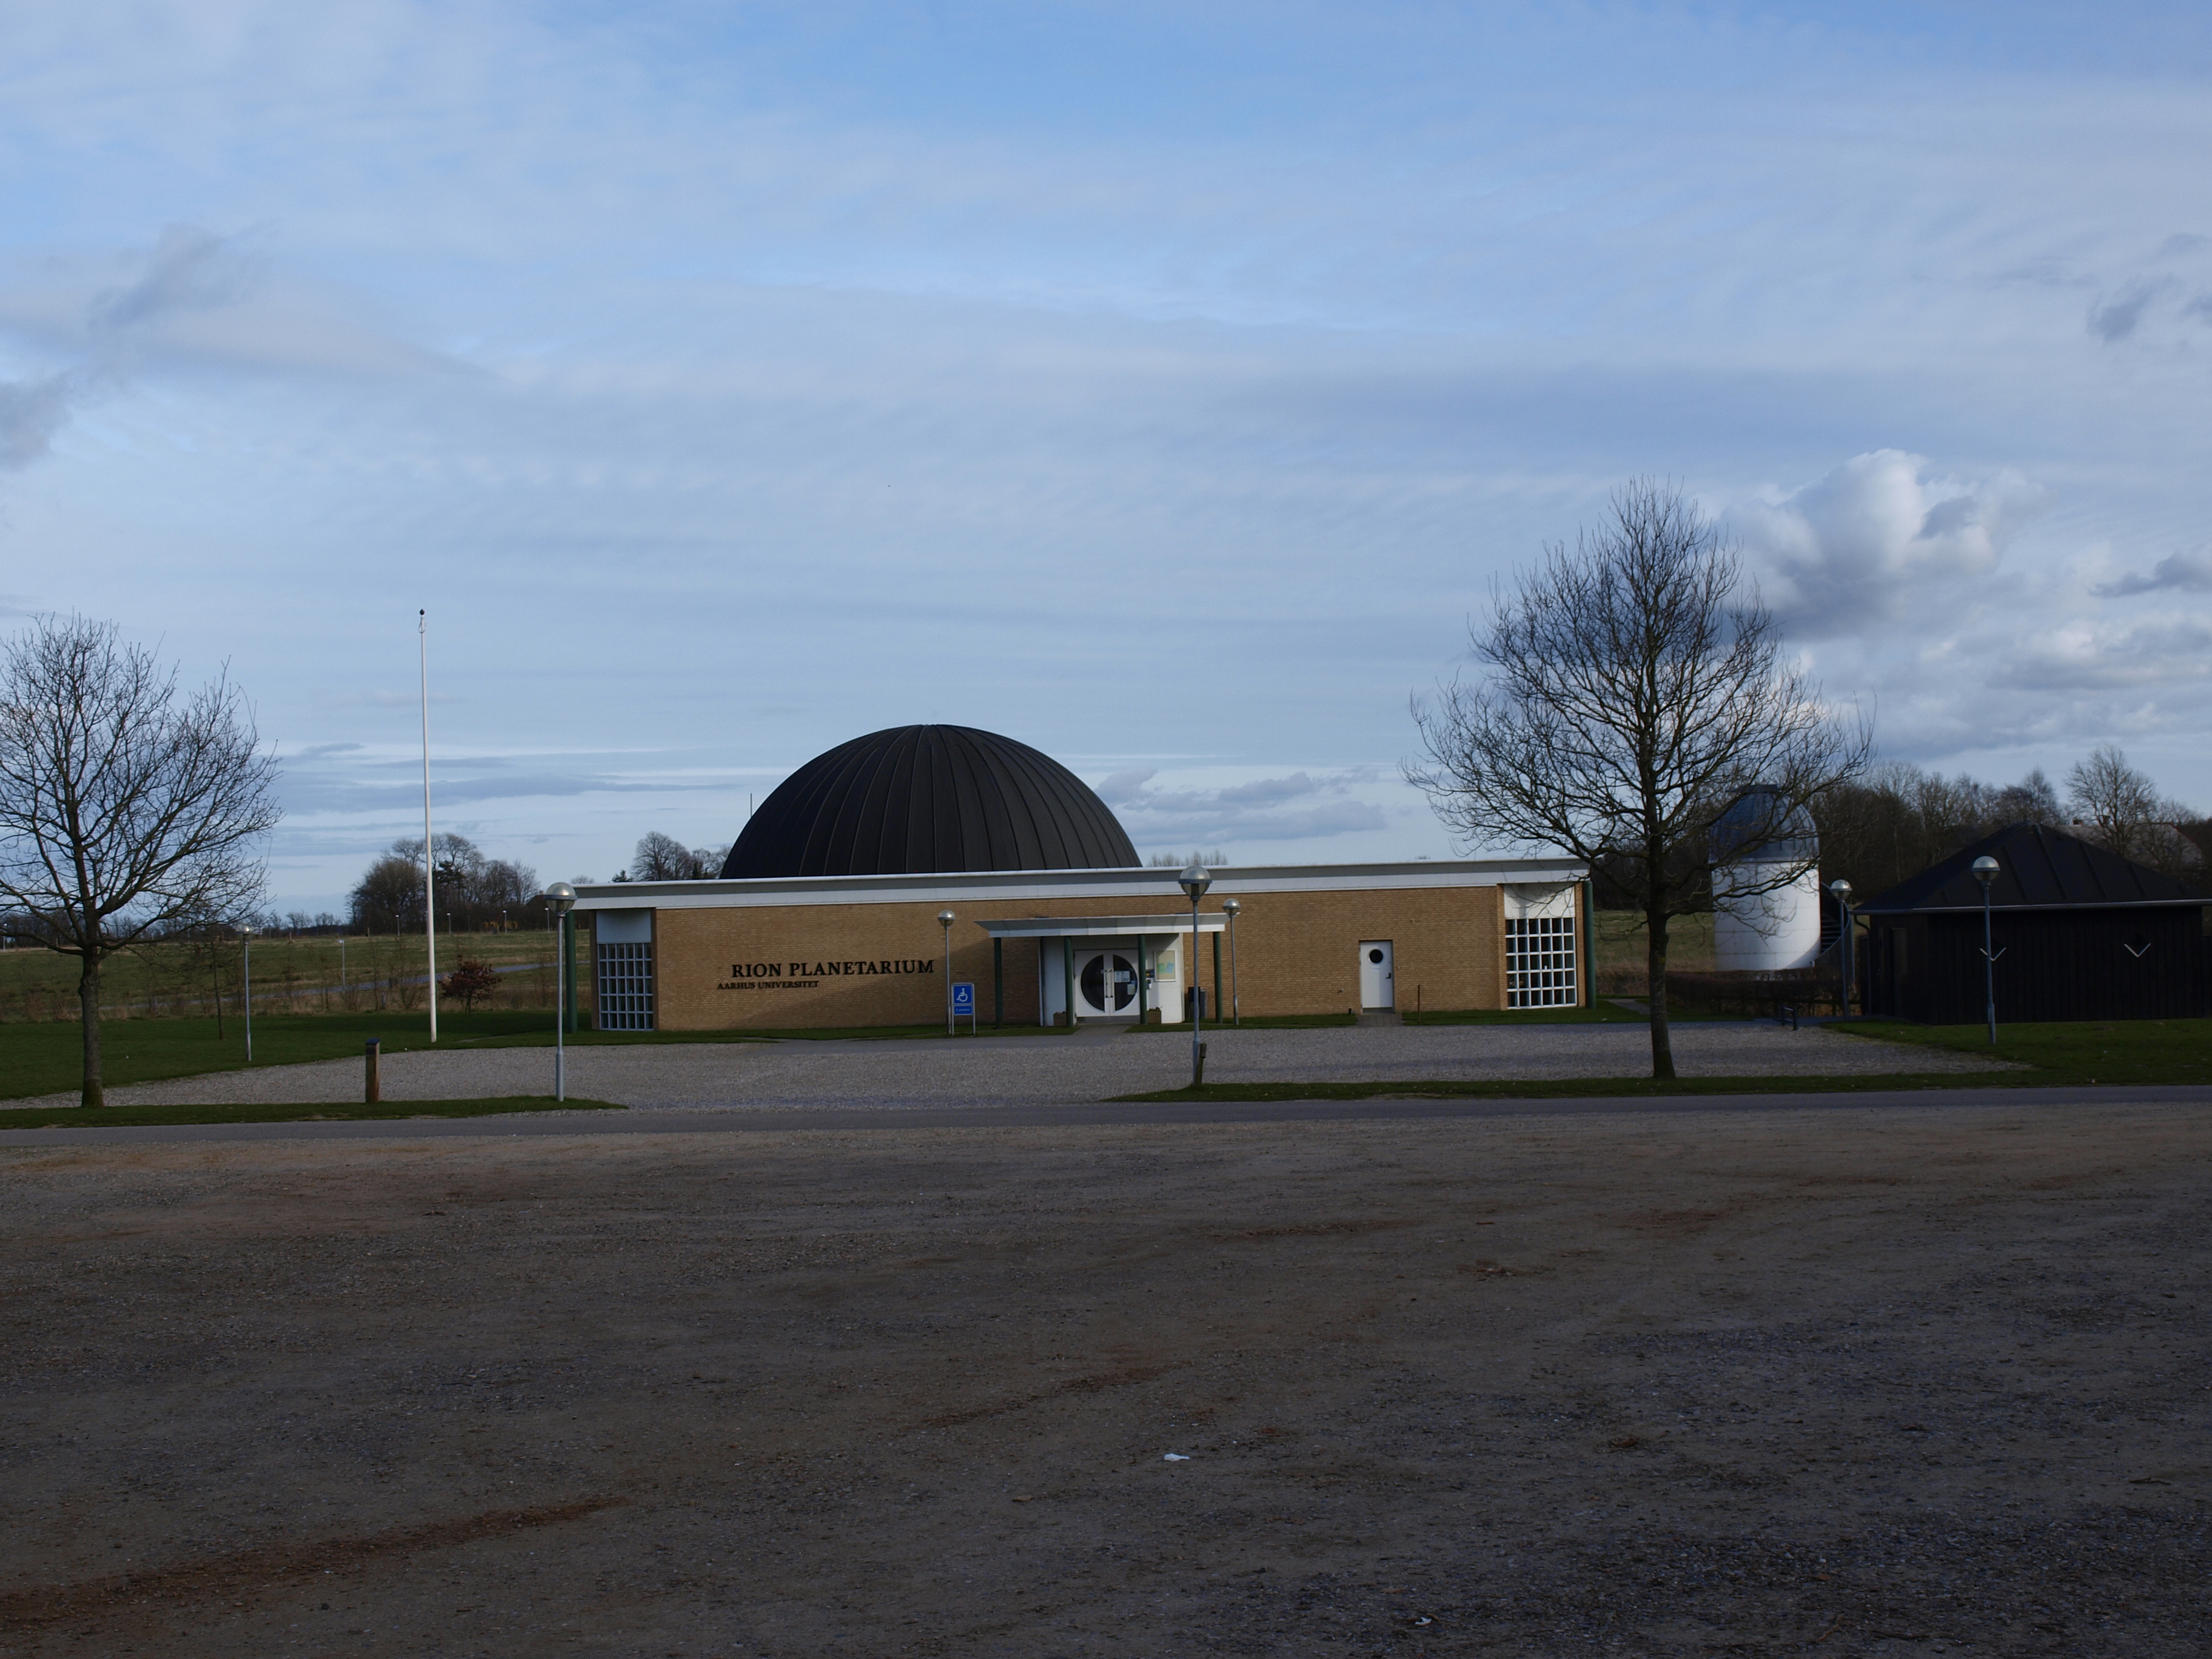 Fileorion Planetariumjpg Wikimedia Commons